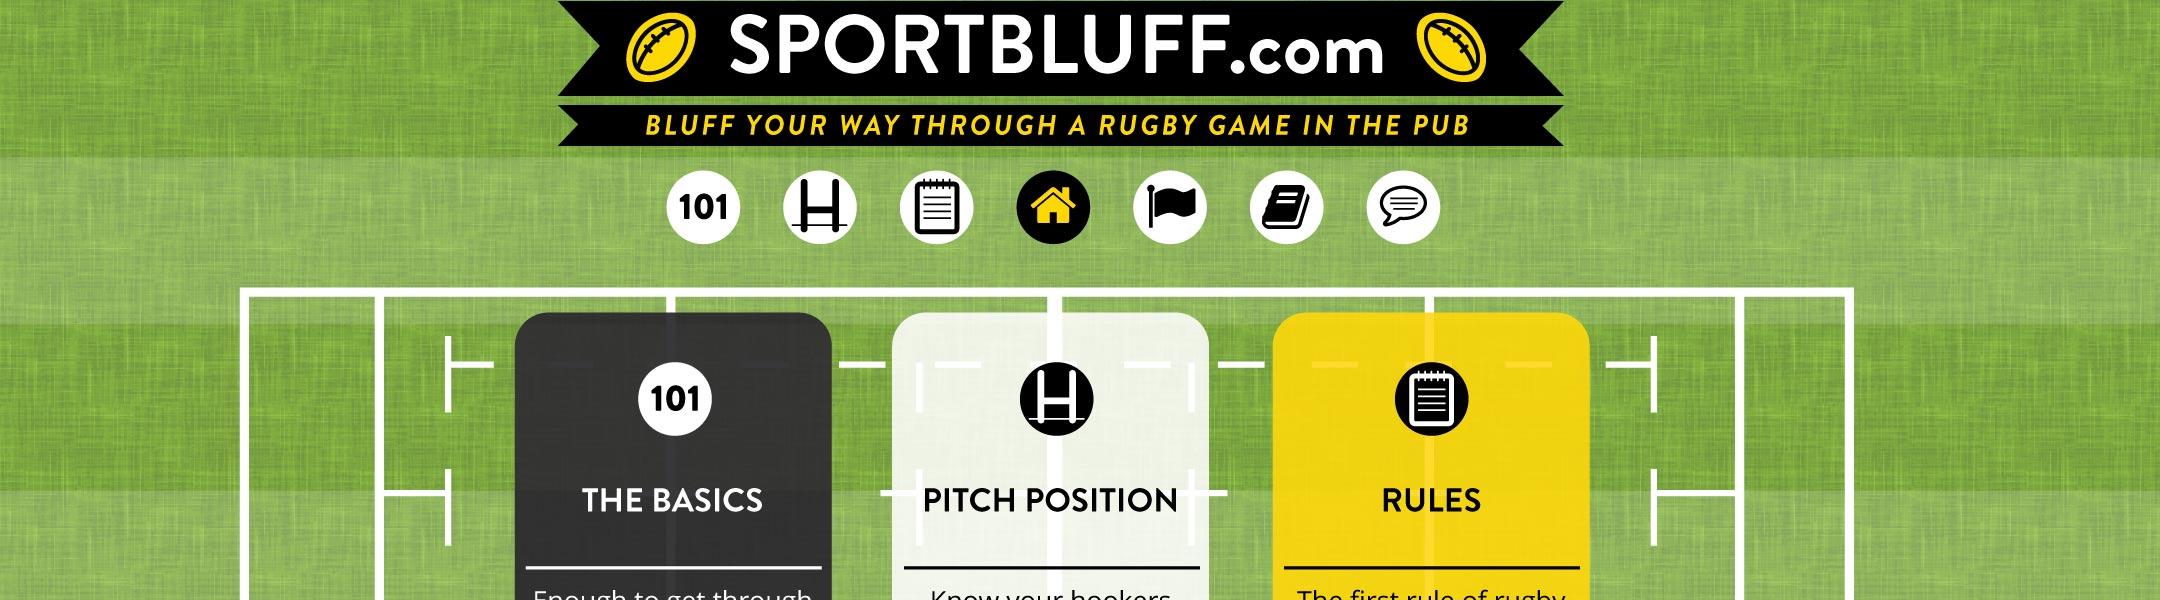 Sportbluff